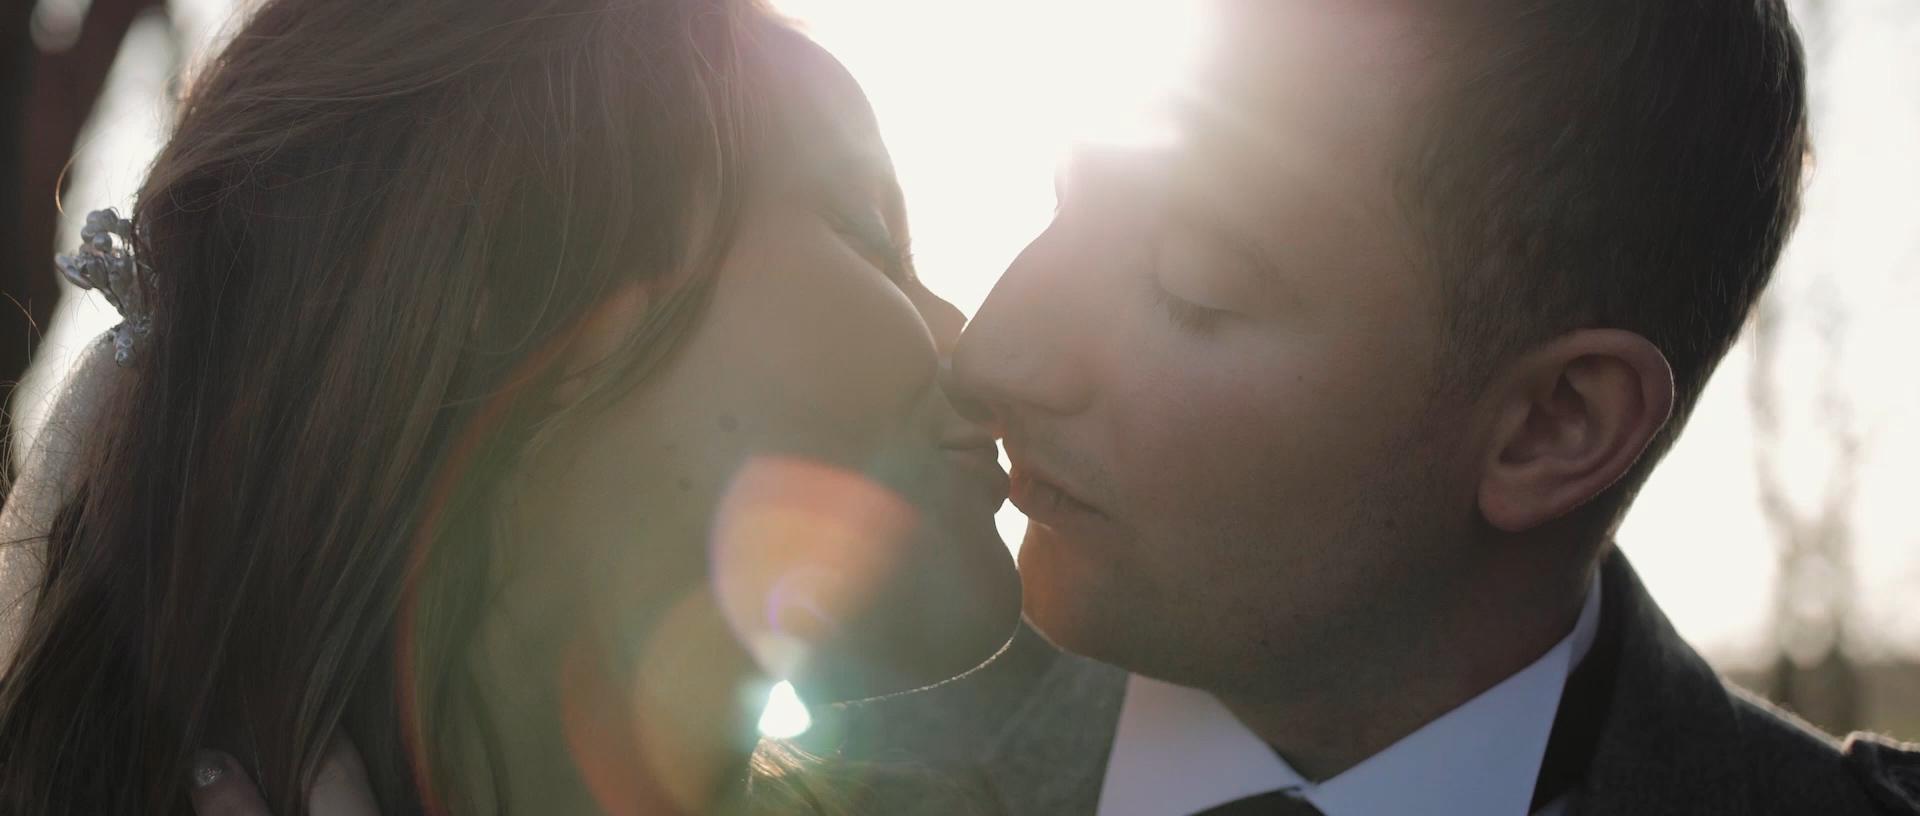 pollokshields-burgh-hall-wedding-videographer_LL_03.jpg